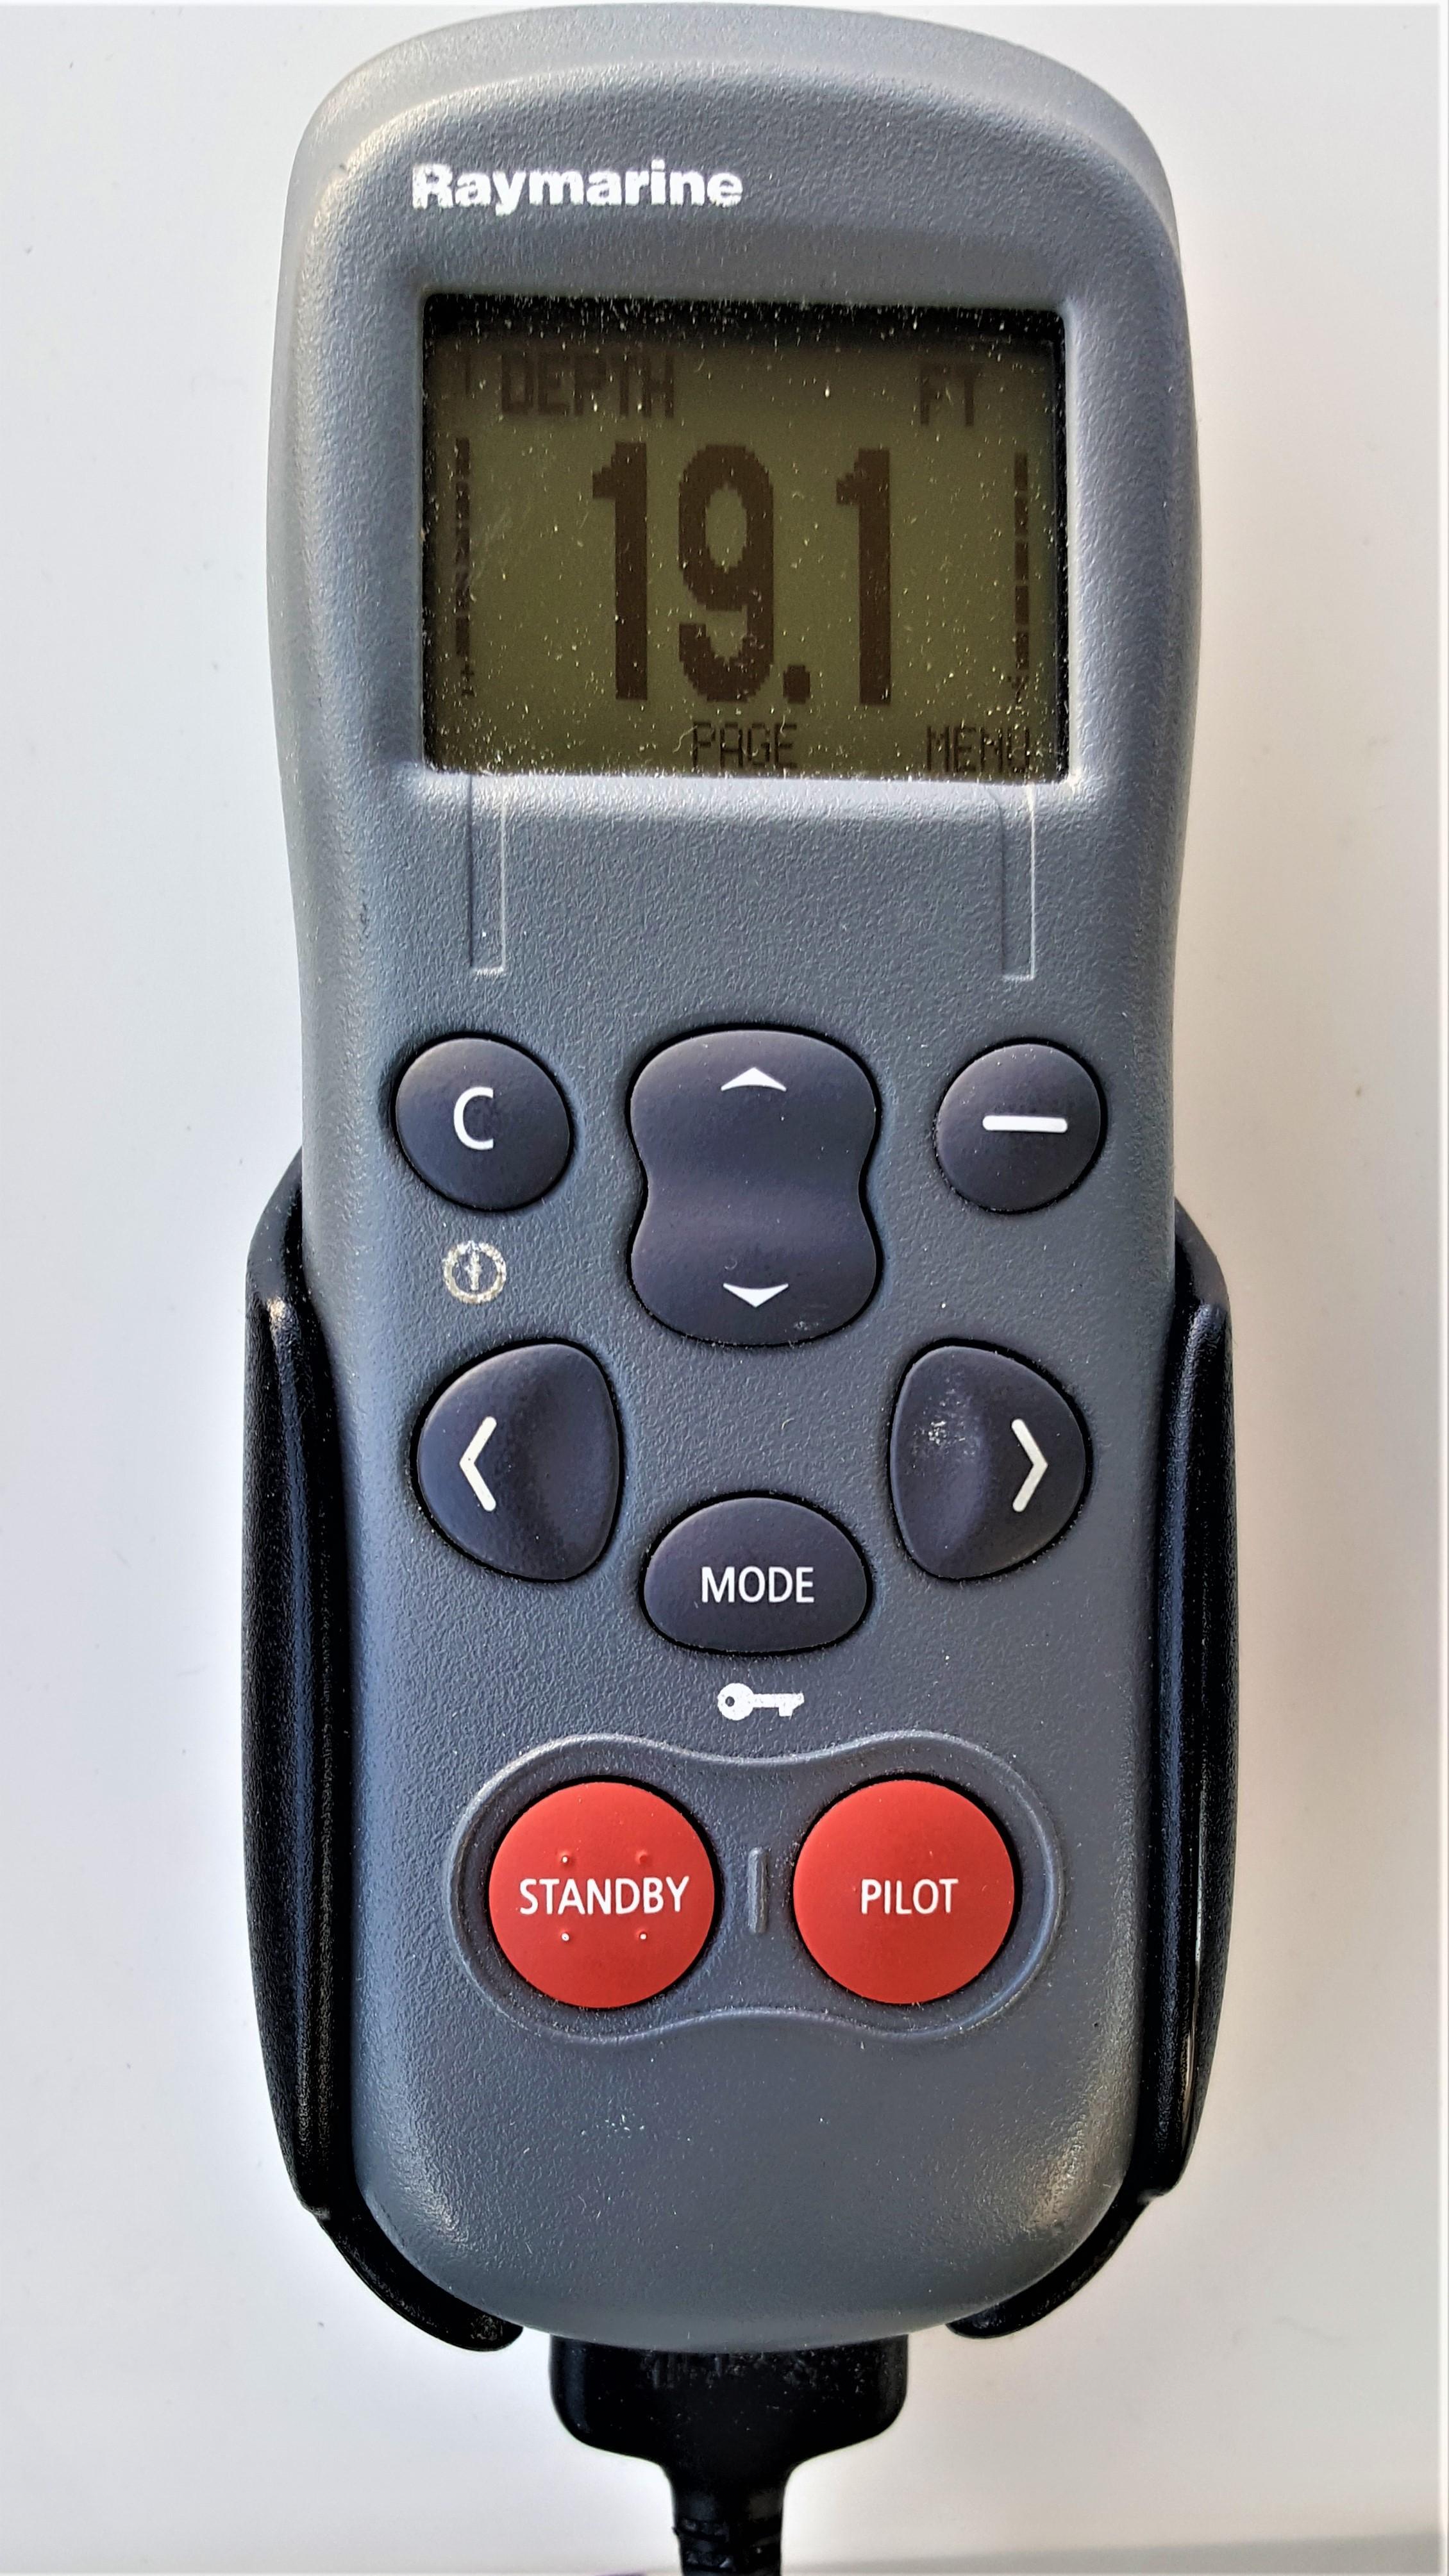 Raymarine Handheld Autopilot Remote